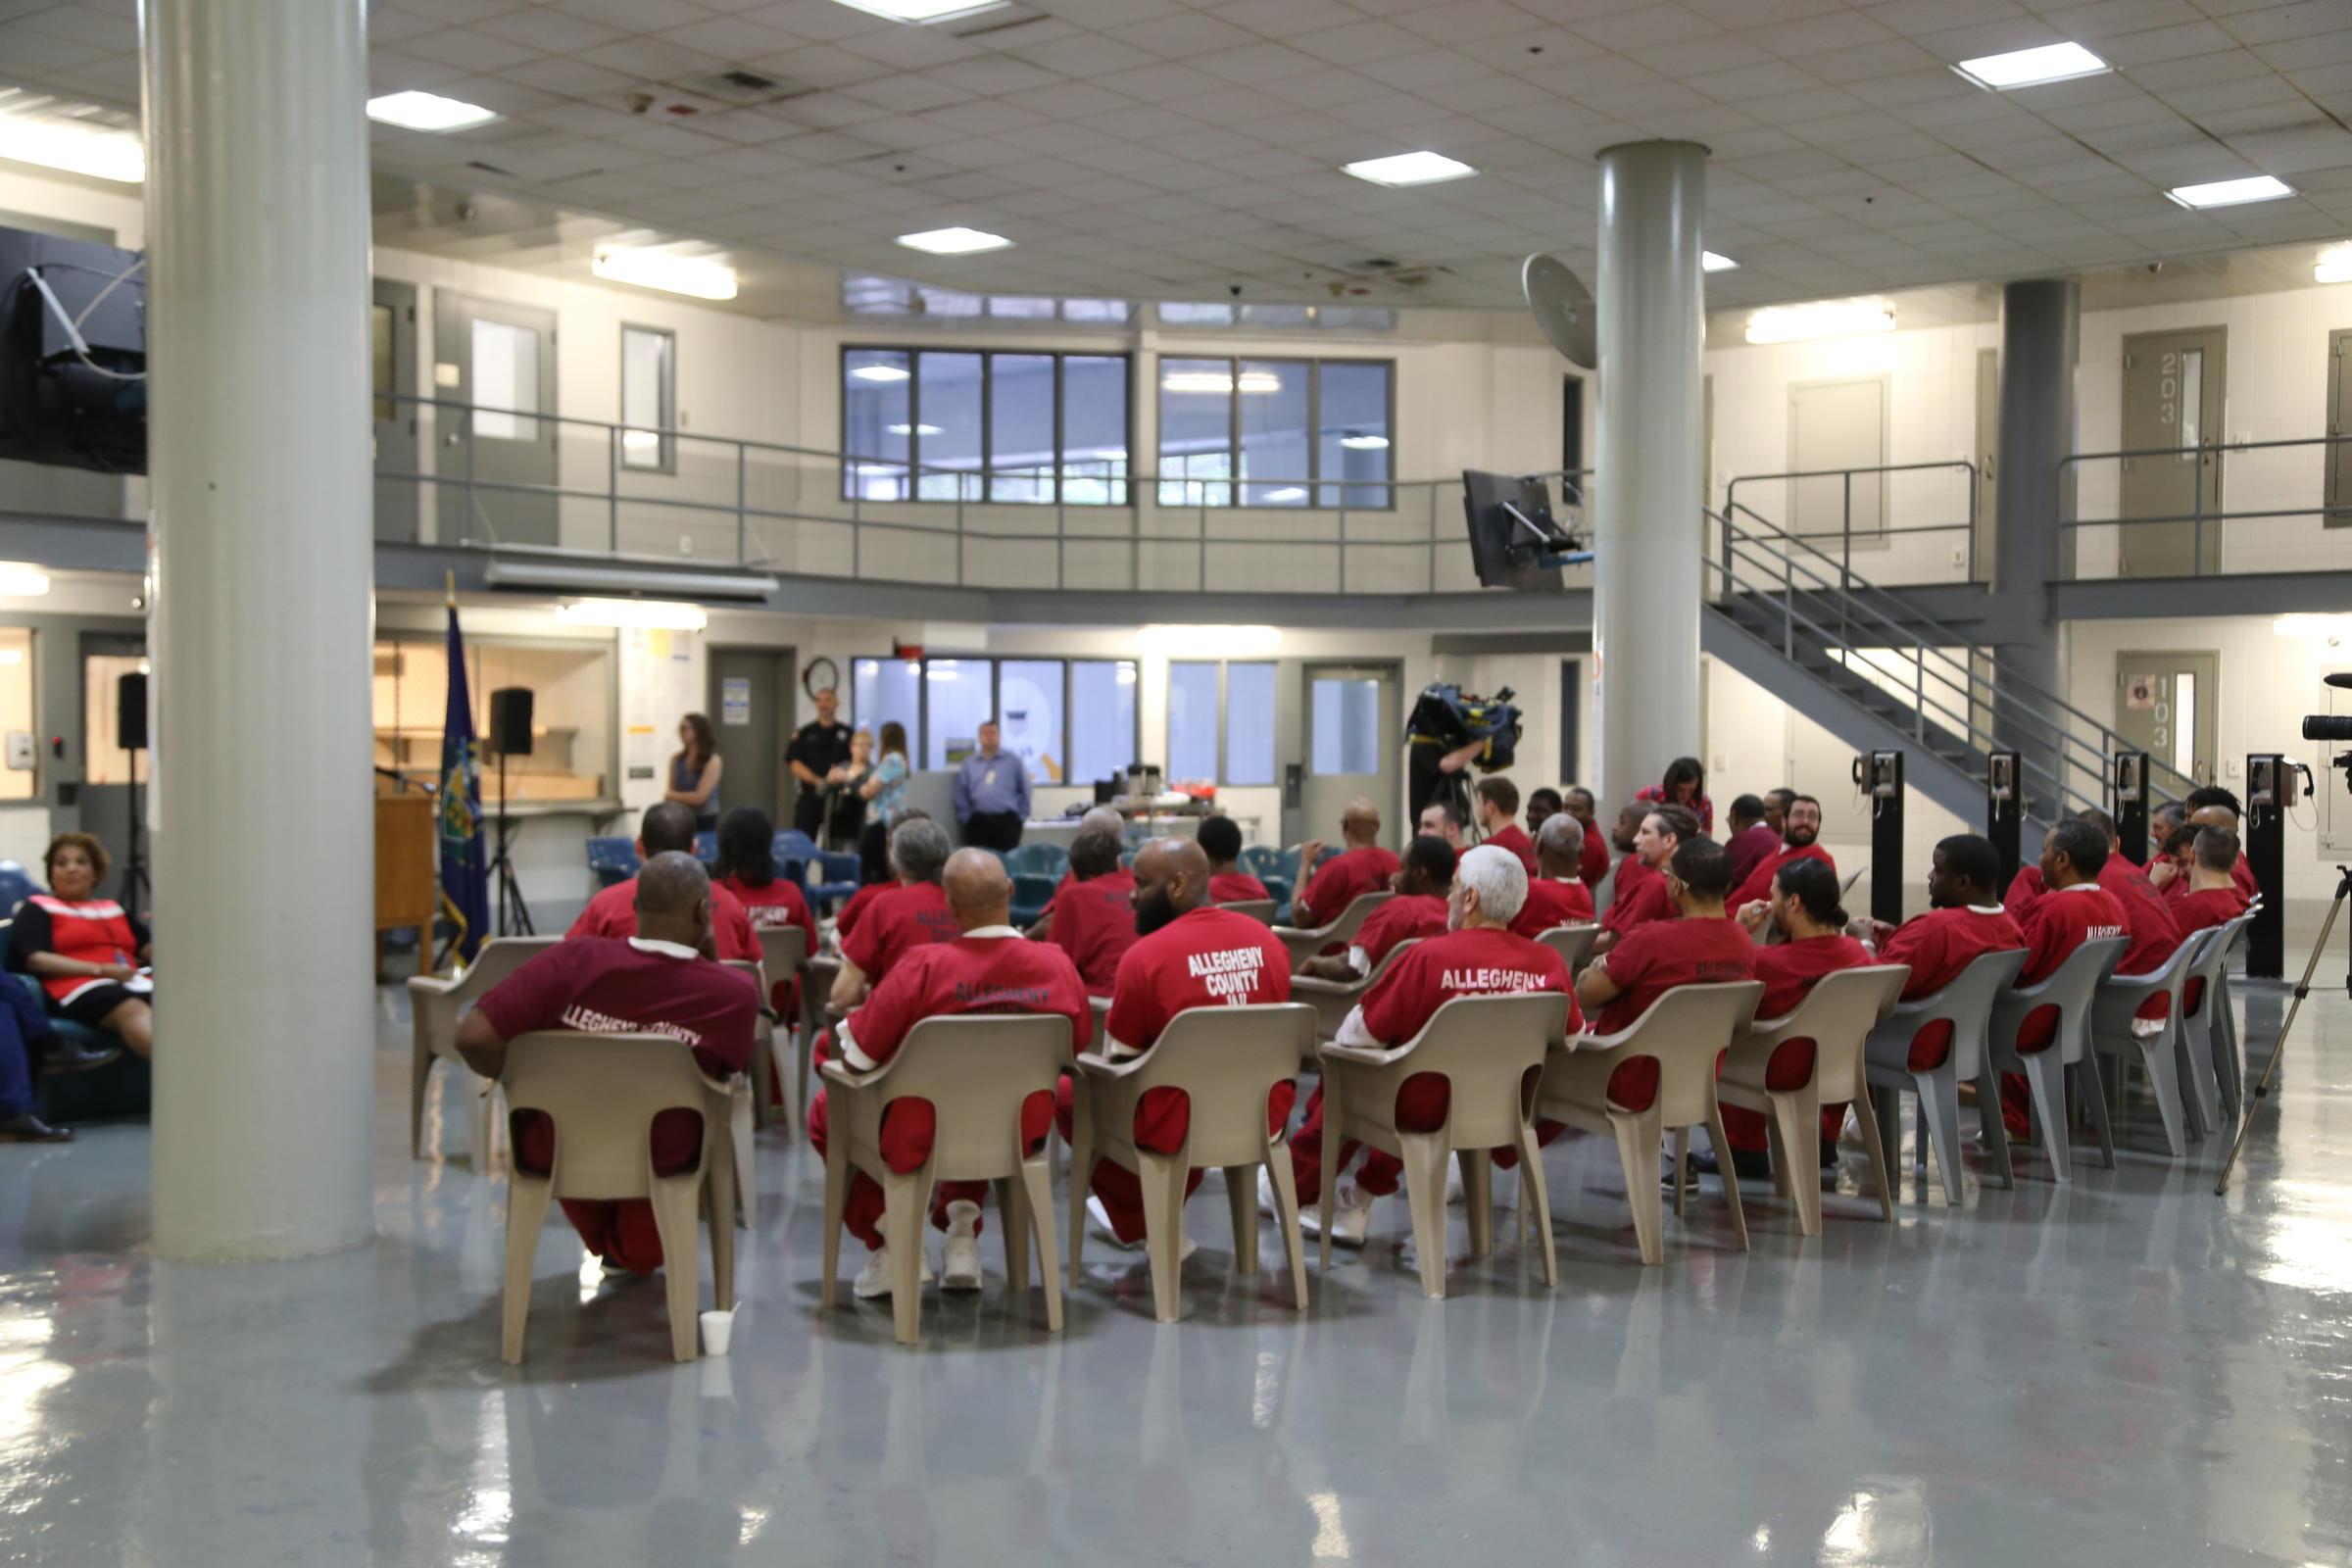 allegheny county jail launches new veteran program 90 5 wesa